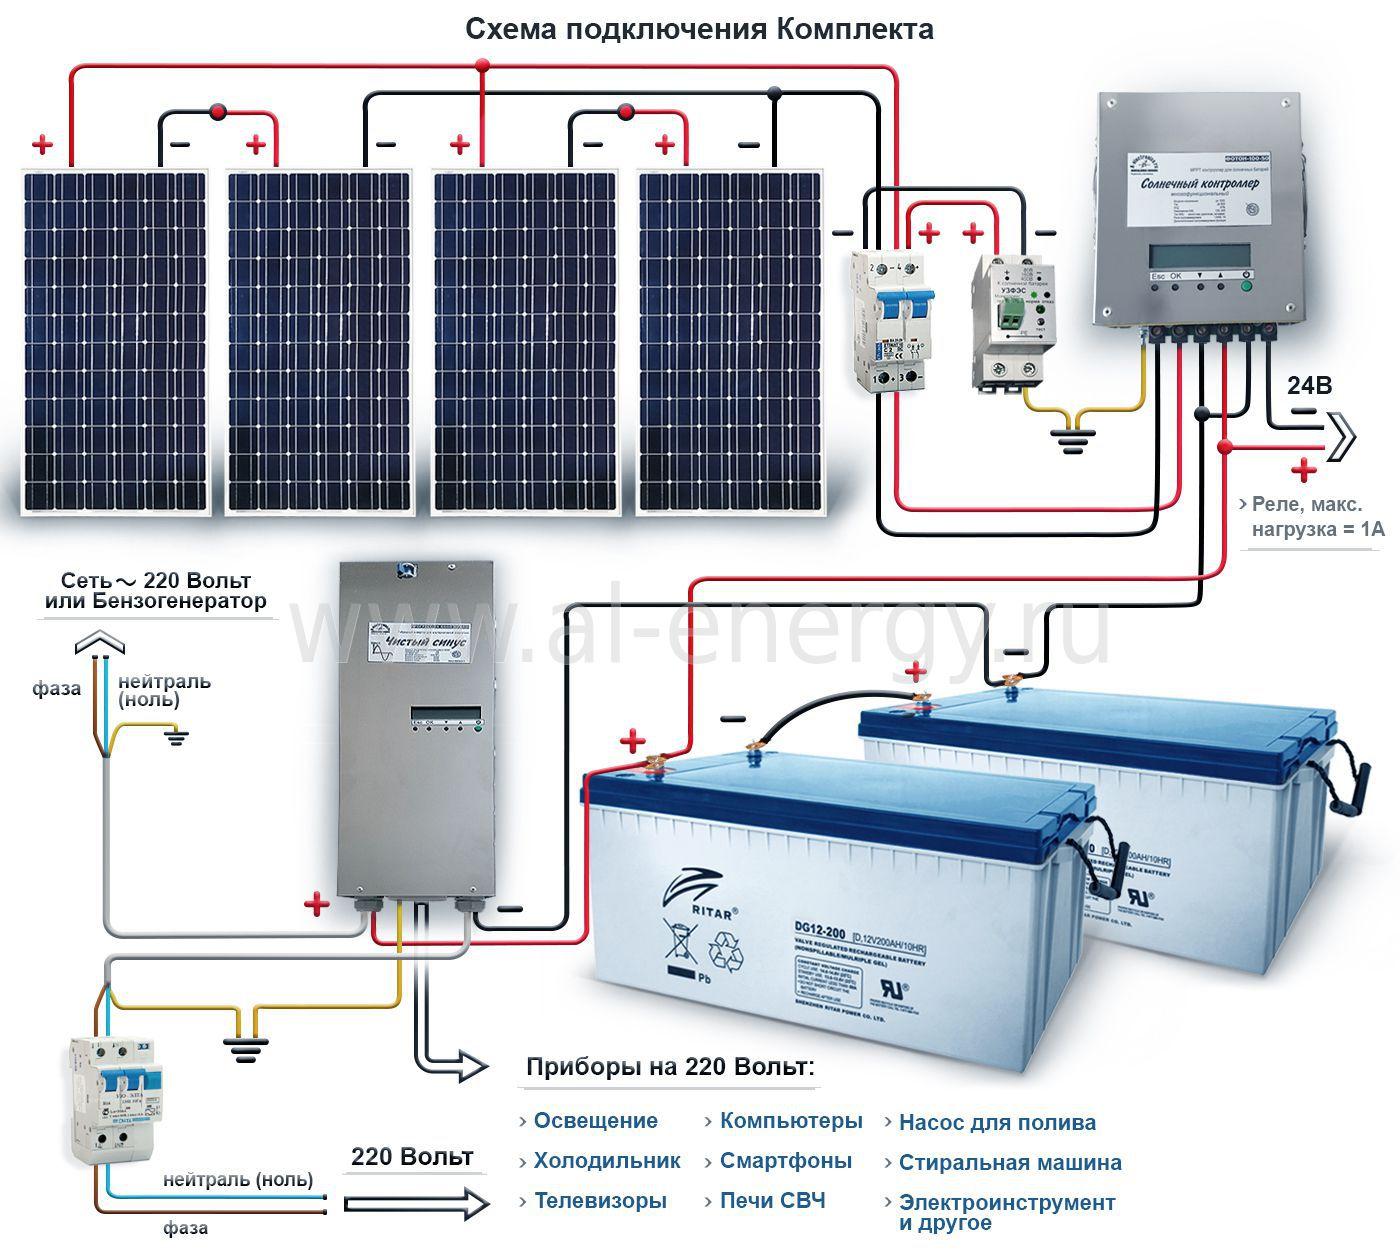 Энергосистема на солнечных батареях, аккумуляторе и инверторе – самэлектрик.ру